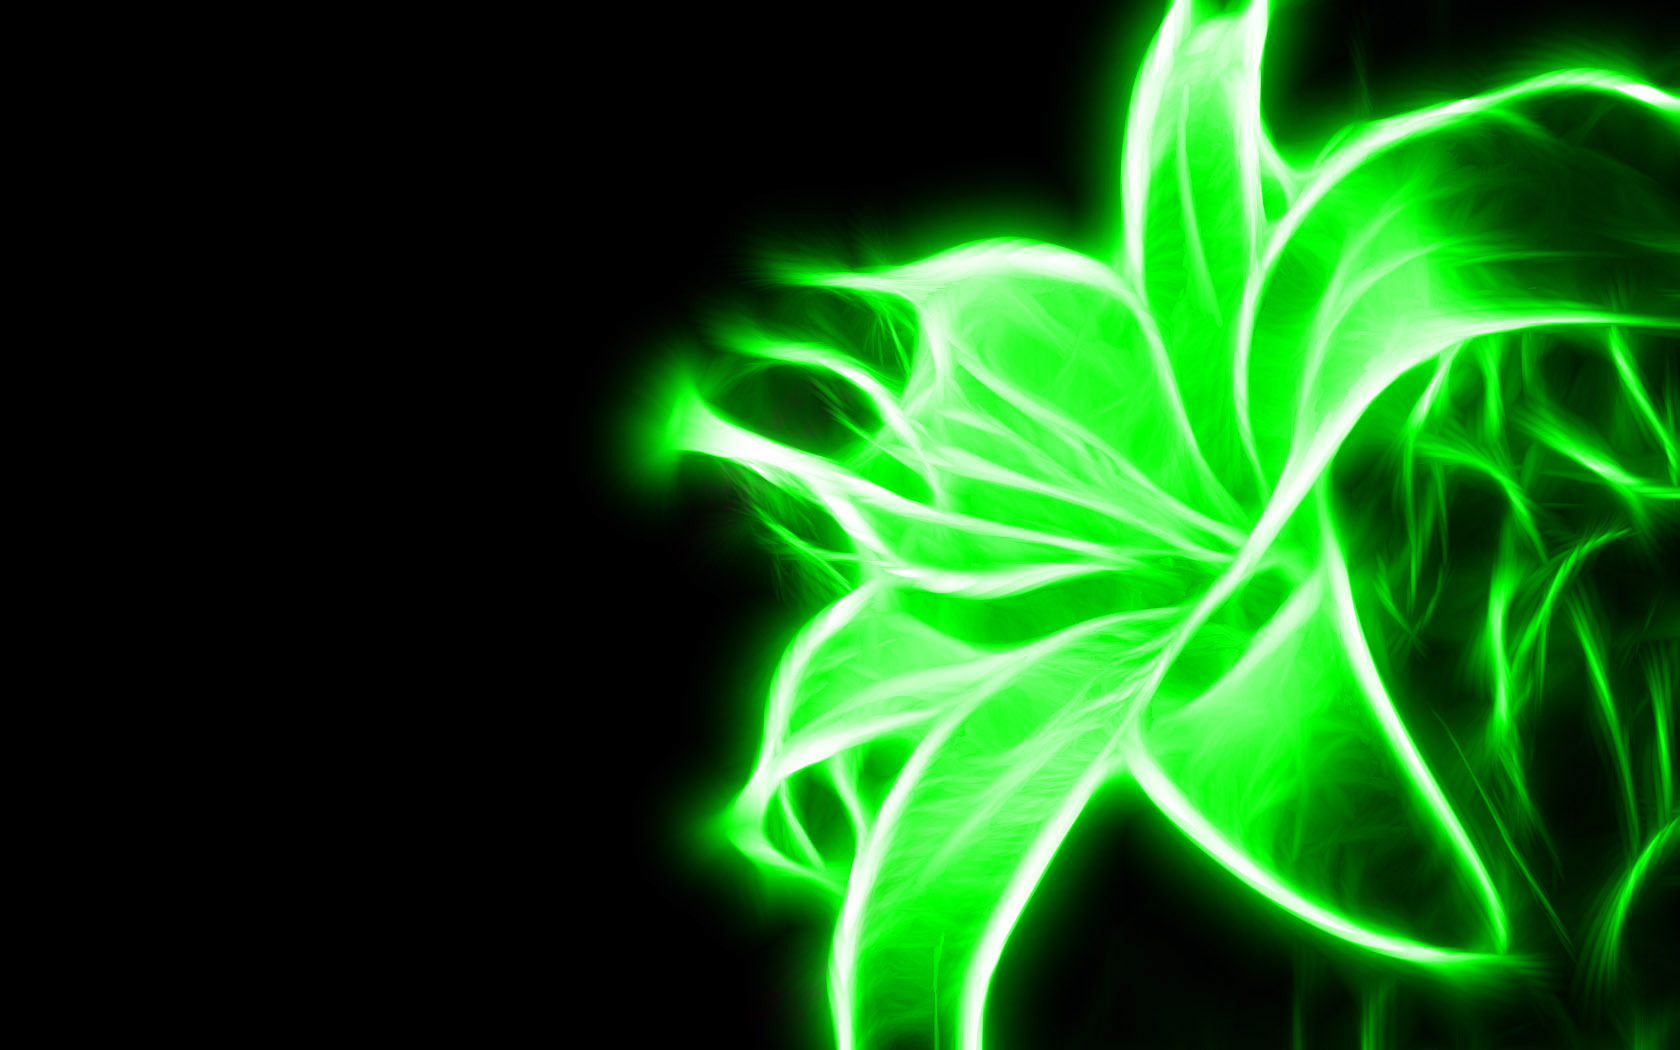 Neon green flower wallpaper hd widescreen wallpapers ImgStockscom 1680x1050